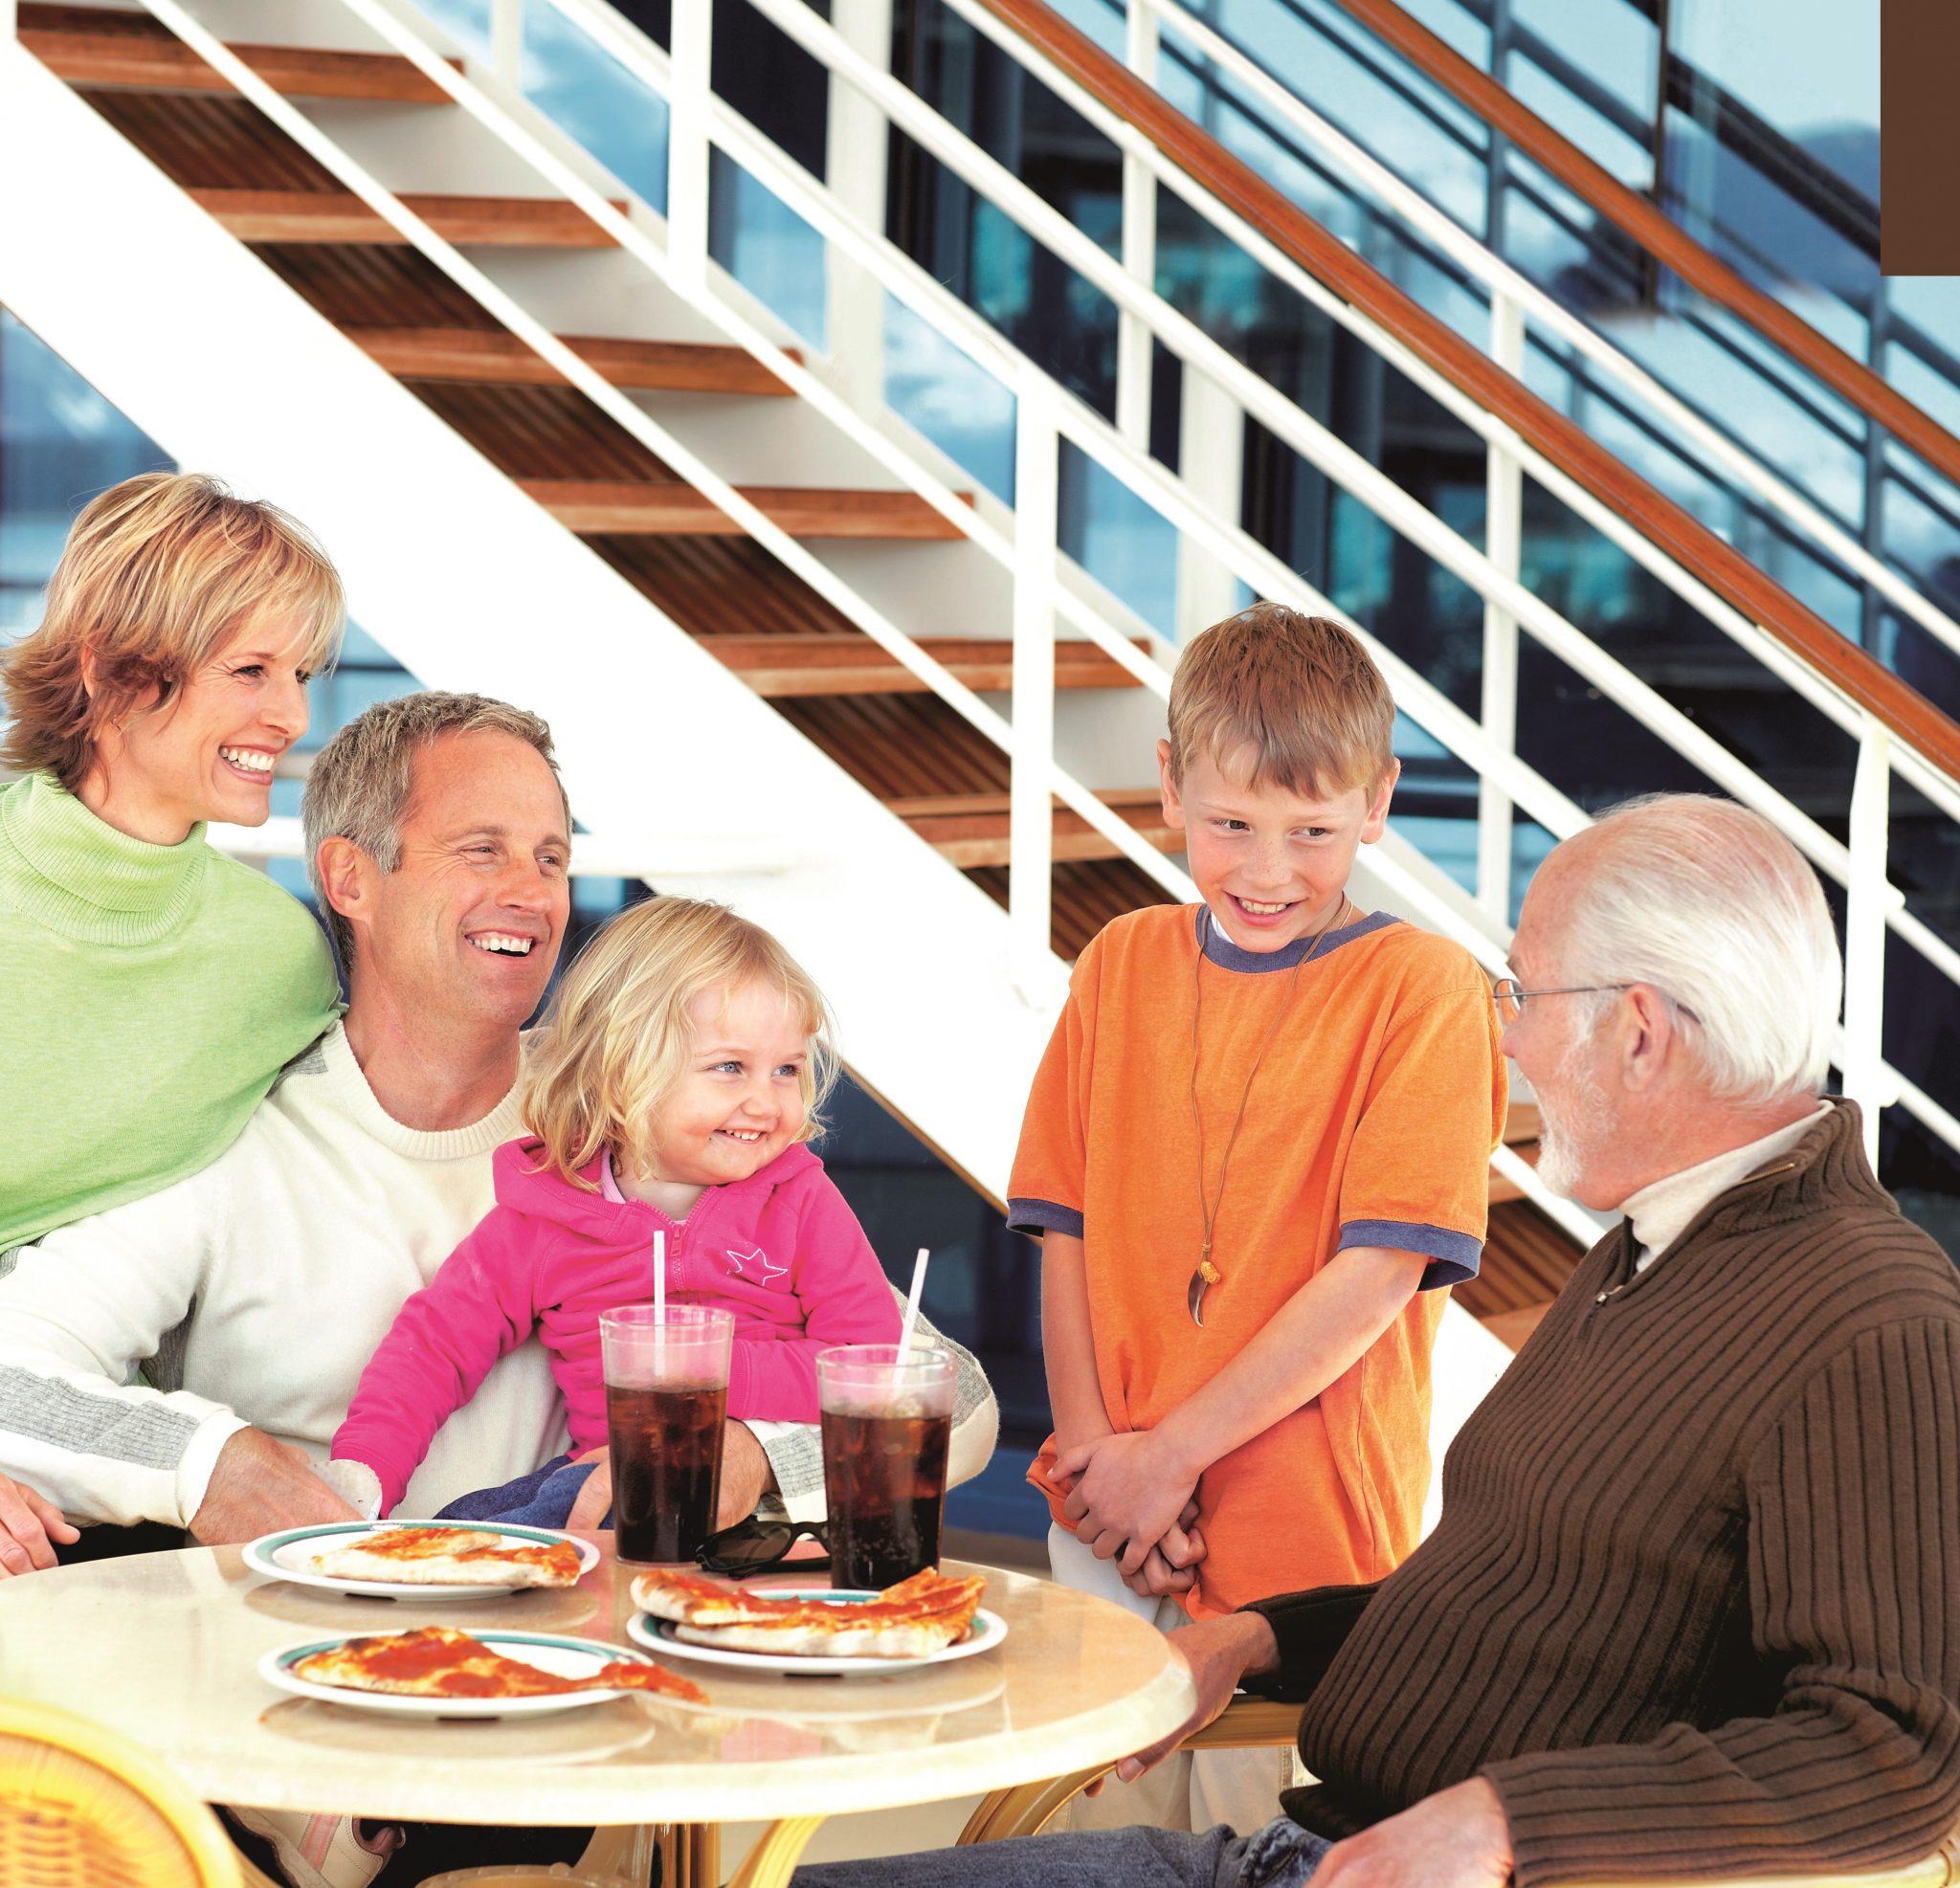 Kid Friendly Backyard Landscaping: Princess Cruise Line Has Amazing Kid Friendly Programs